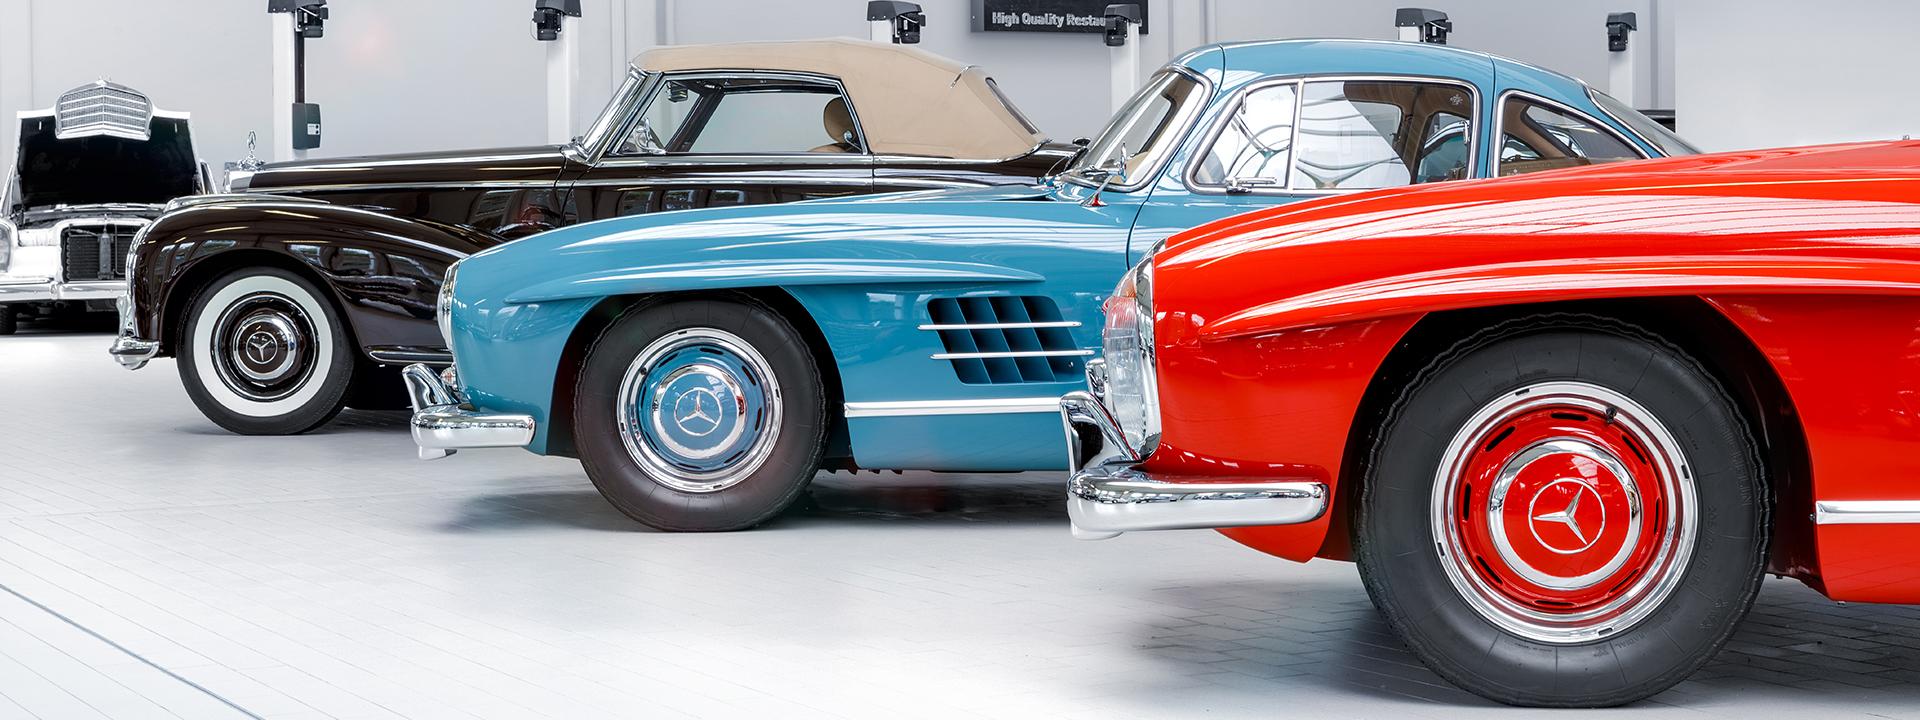 300 SL Gullwing - Classic Cars - BRABUS